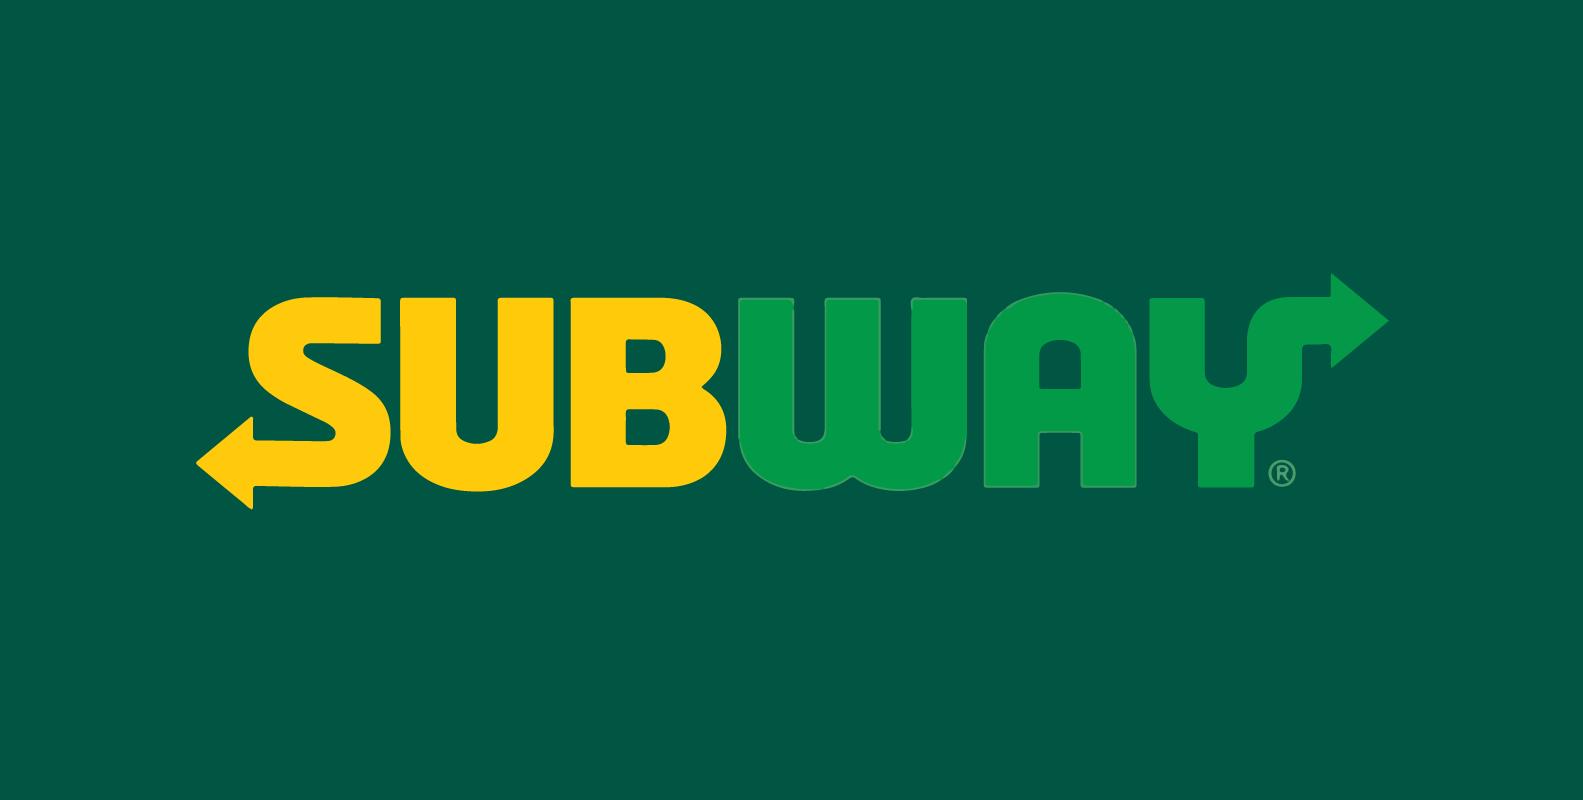 Subway (R)